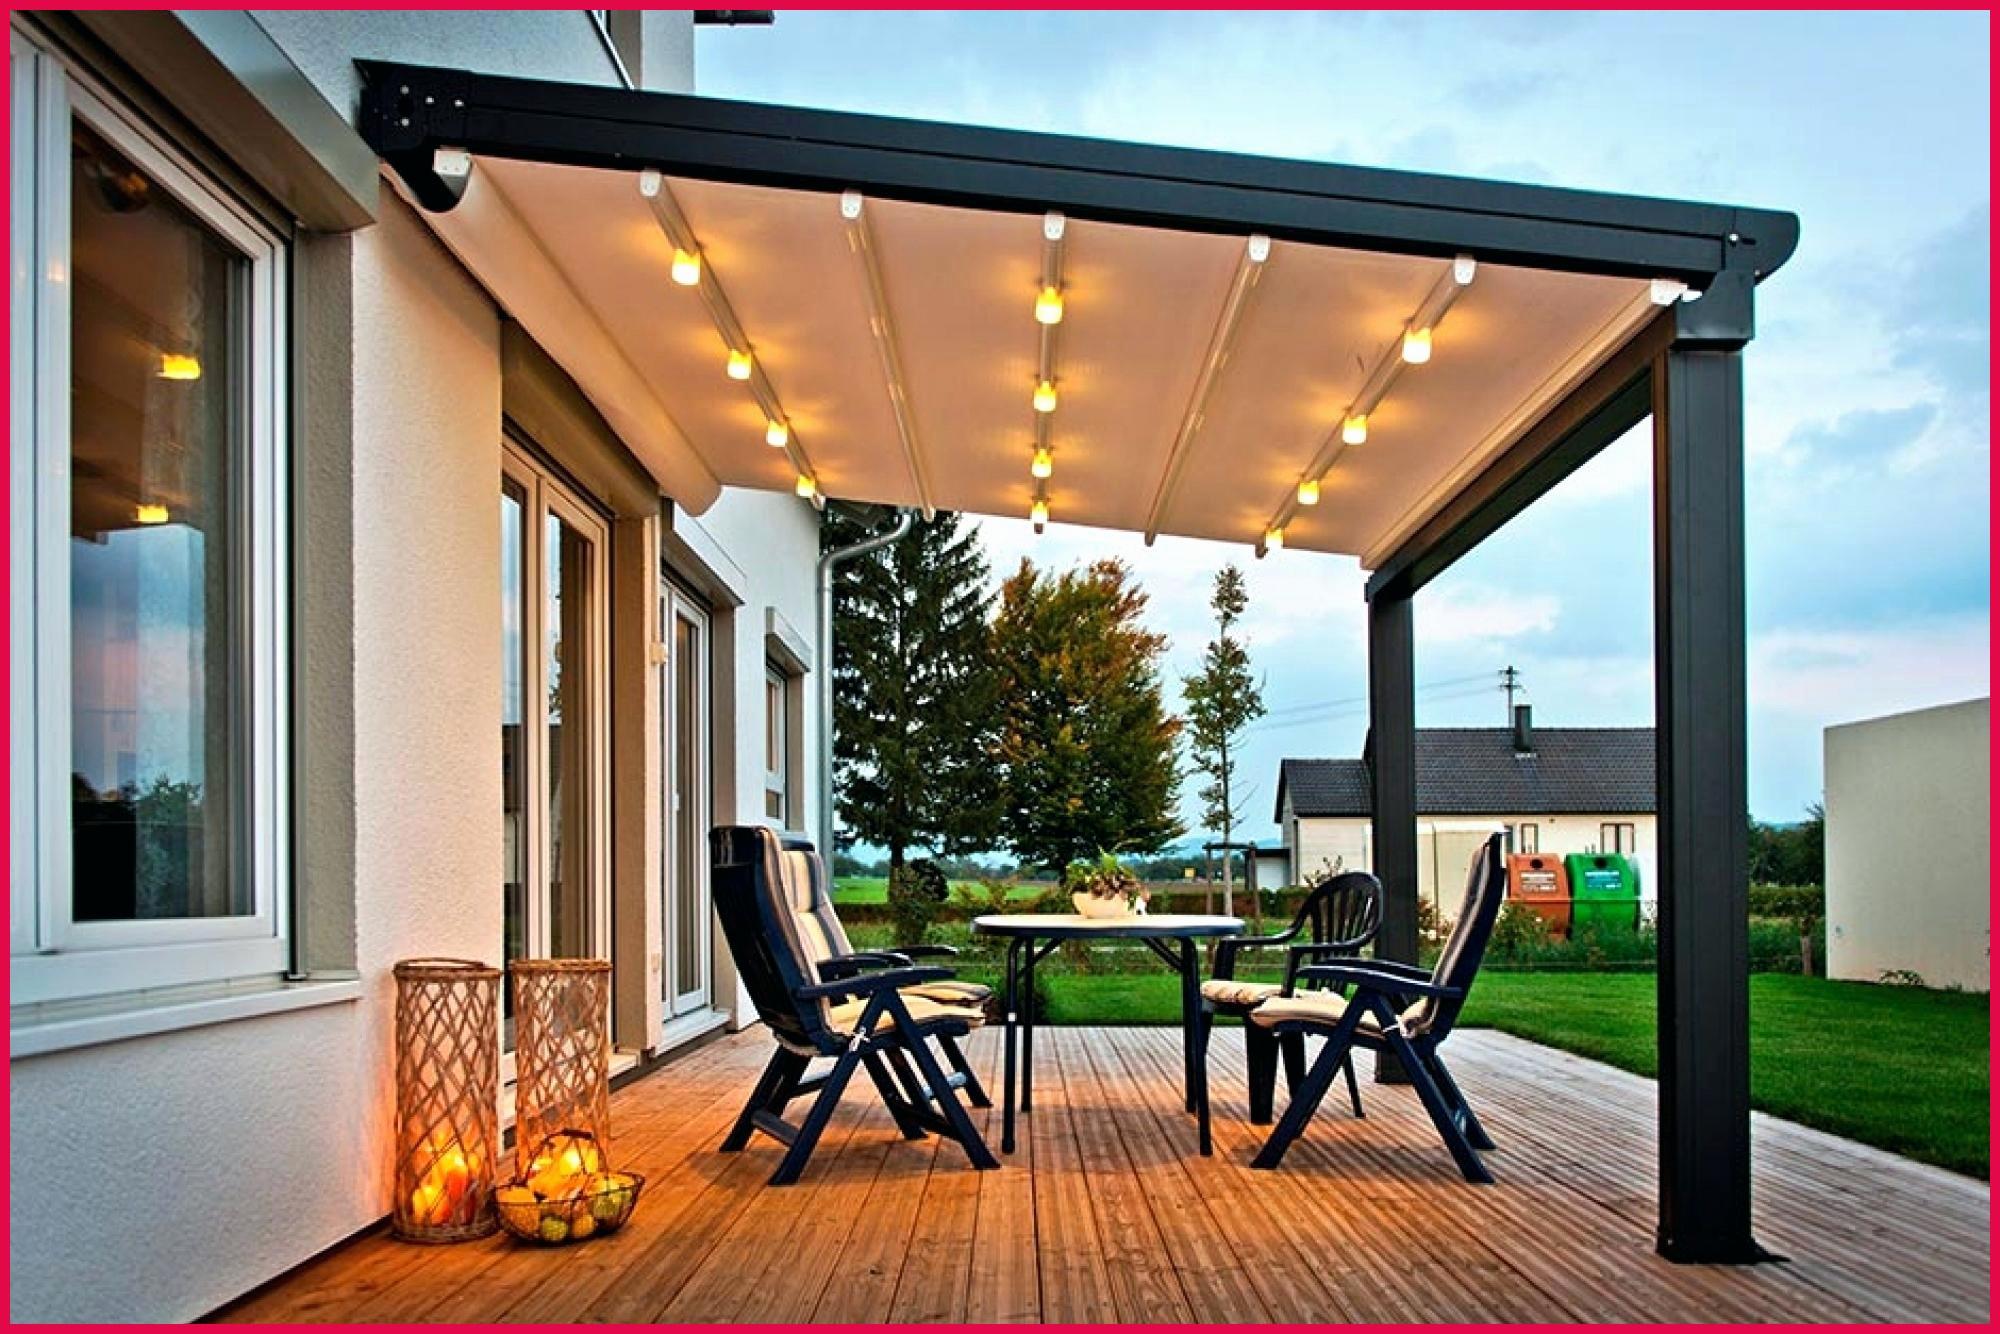 Veranda rideau store interieur - veranda-styledevie.fr